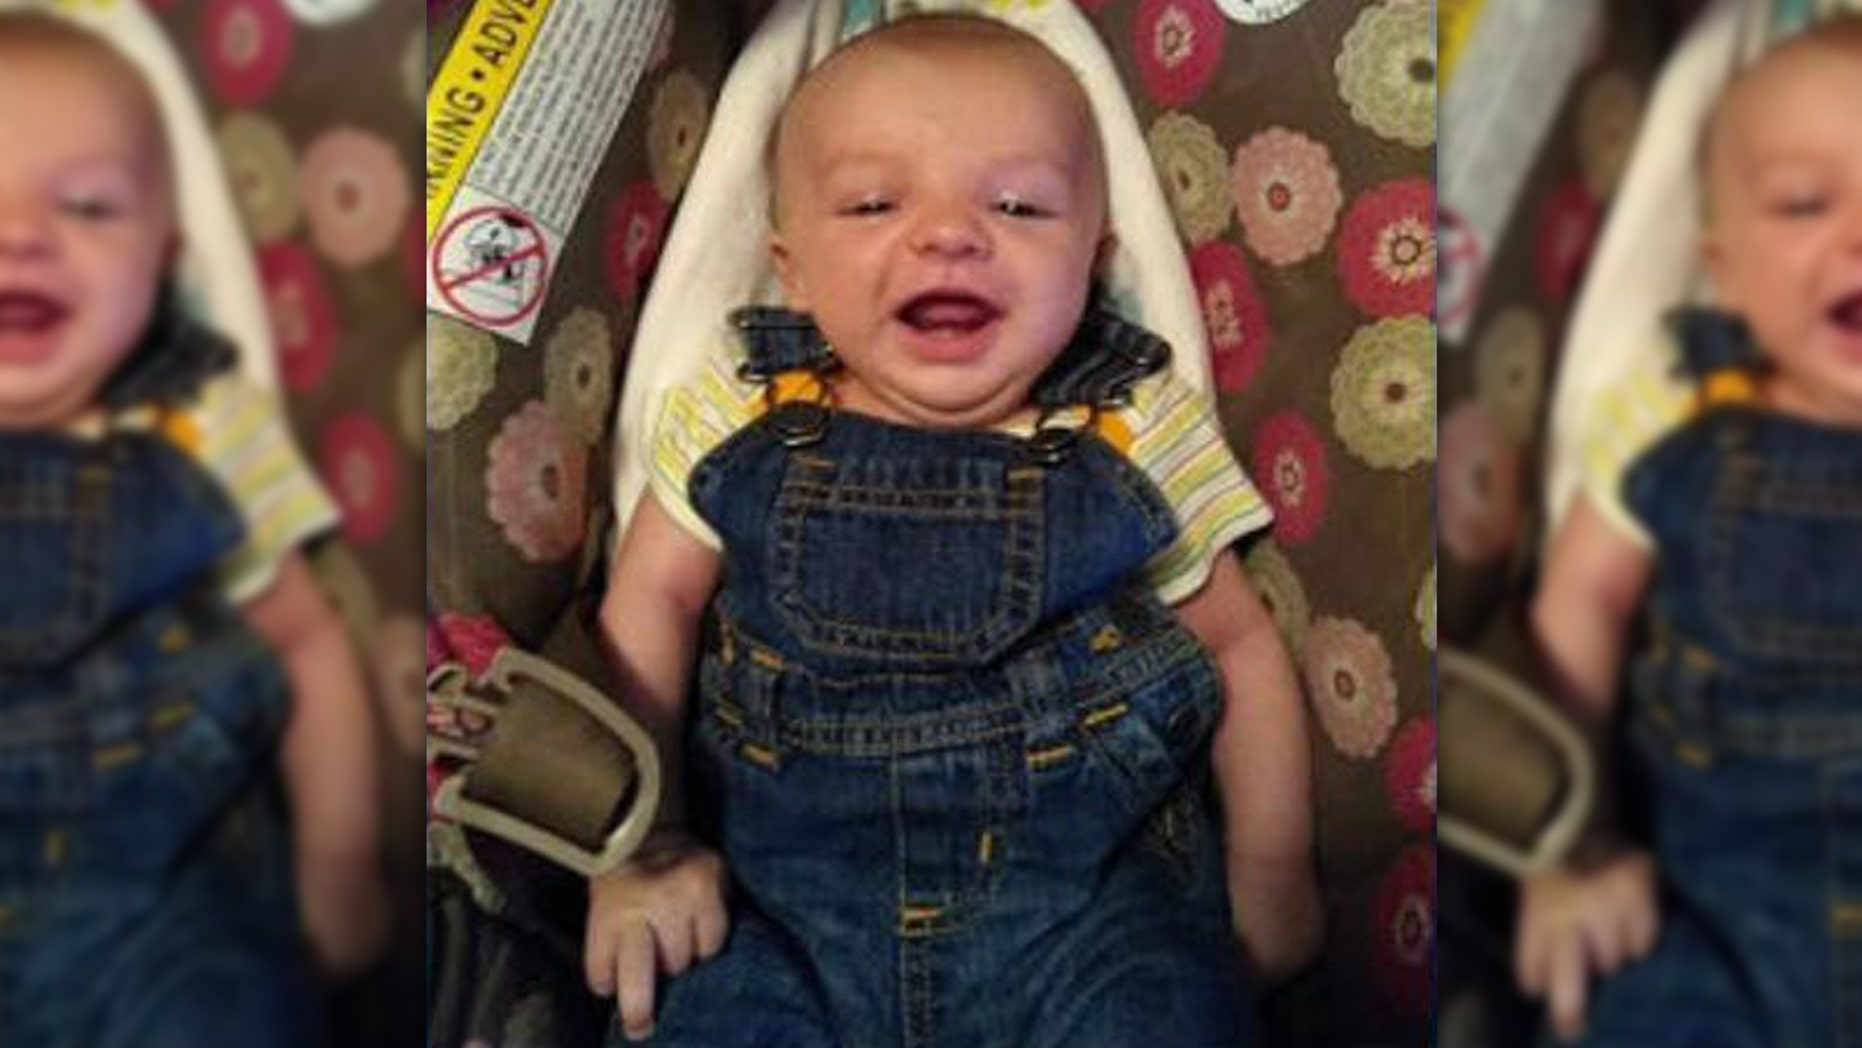 Missing 4-month-old Tyr Lange was found dead Saturday in central North Dakota.